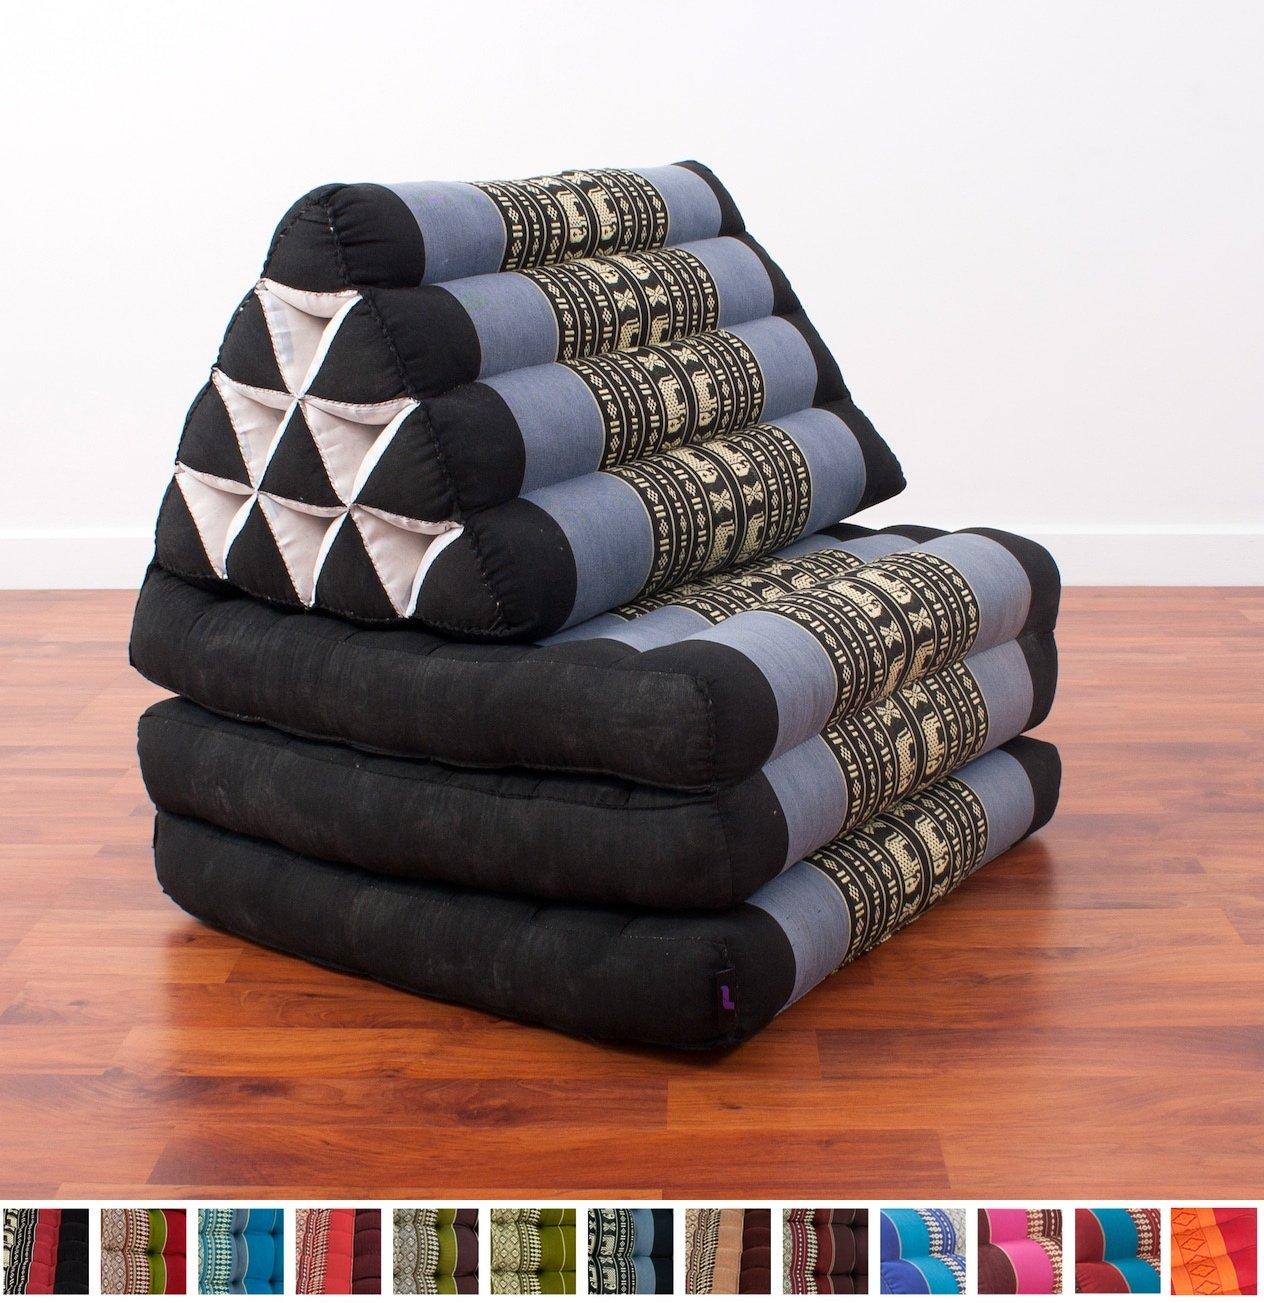 Leewadee Foldout Triangle Thai Cushion, 67x21x3 inches, Kapok Fabric, Blue, Premium Double Stitched by Leewadee